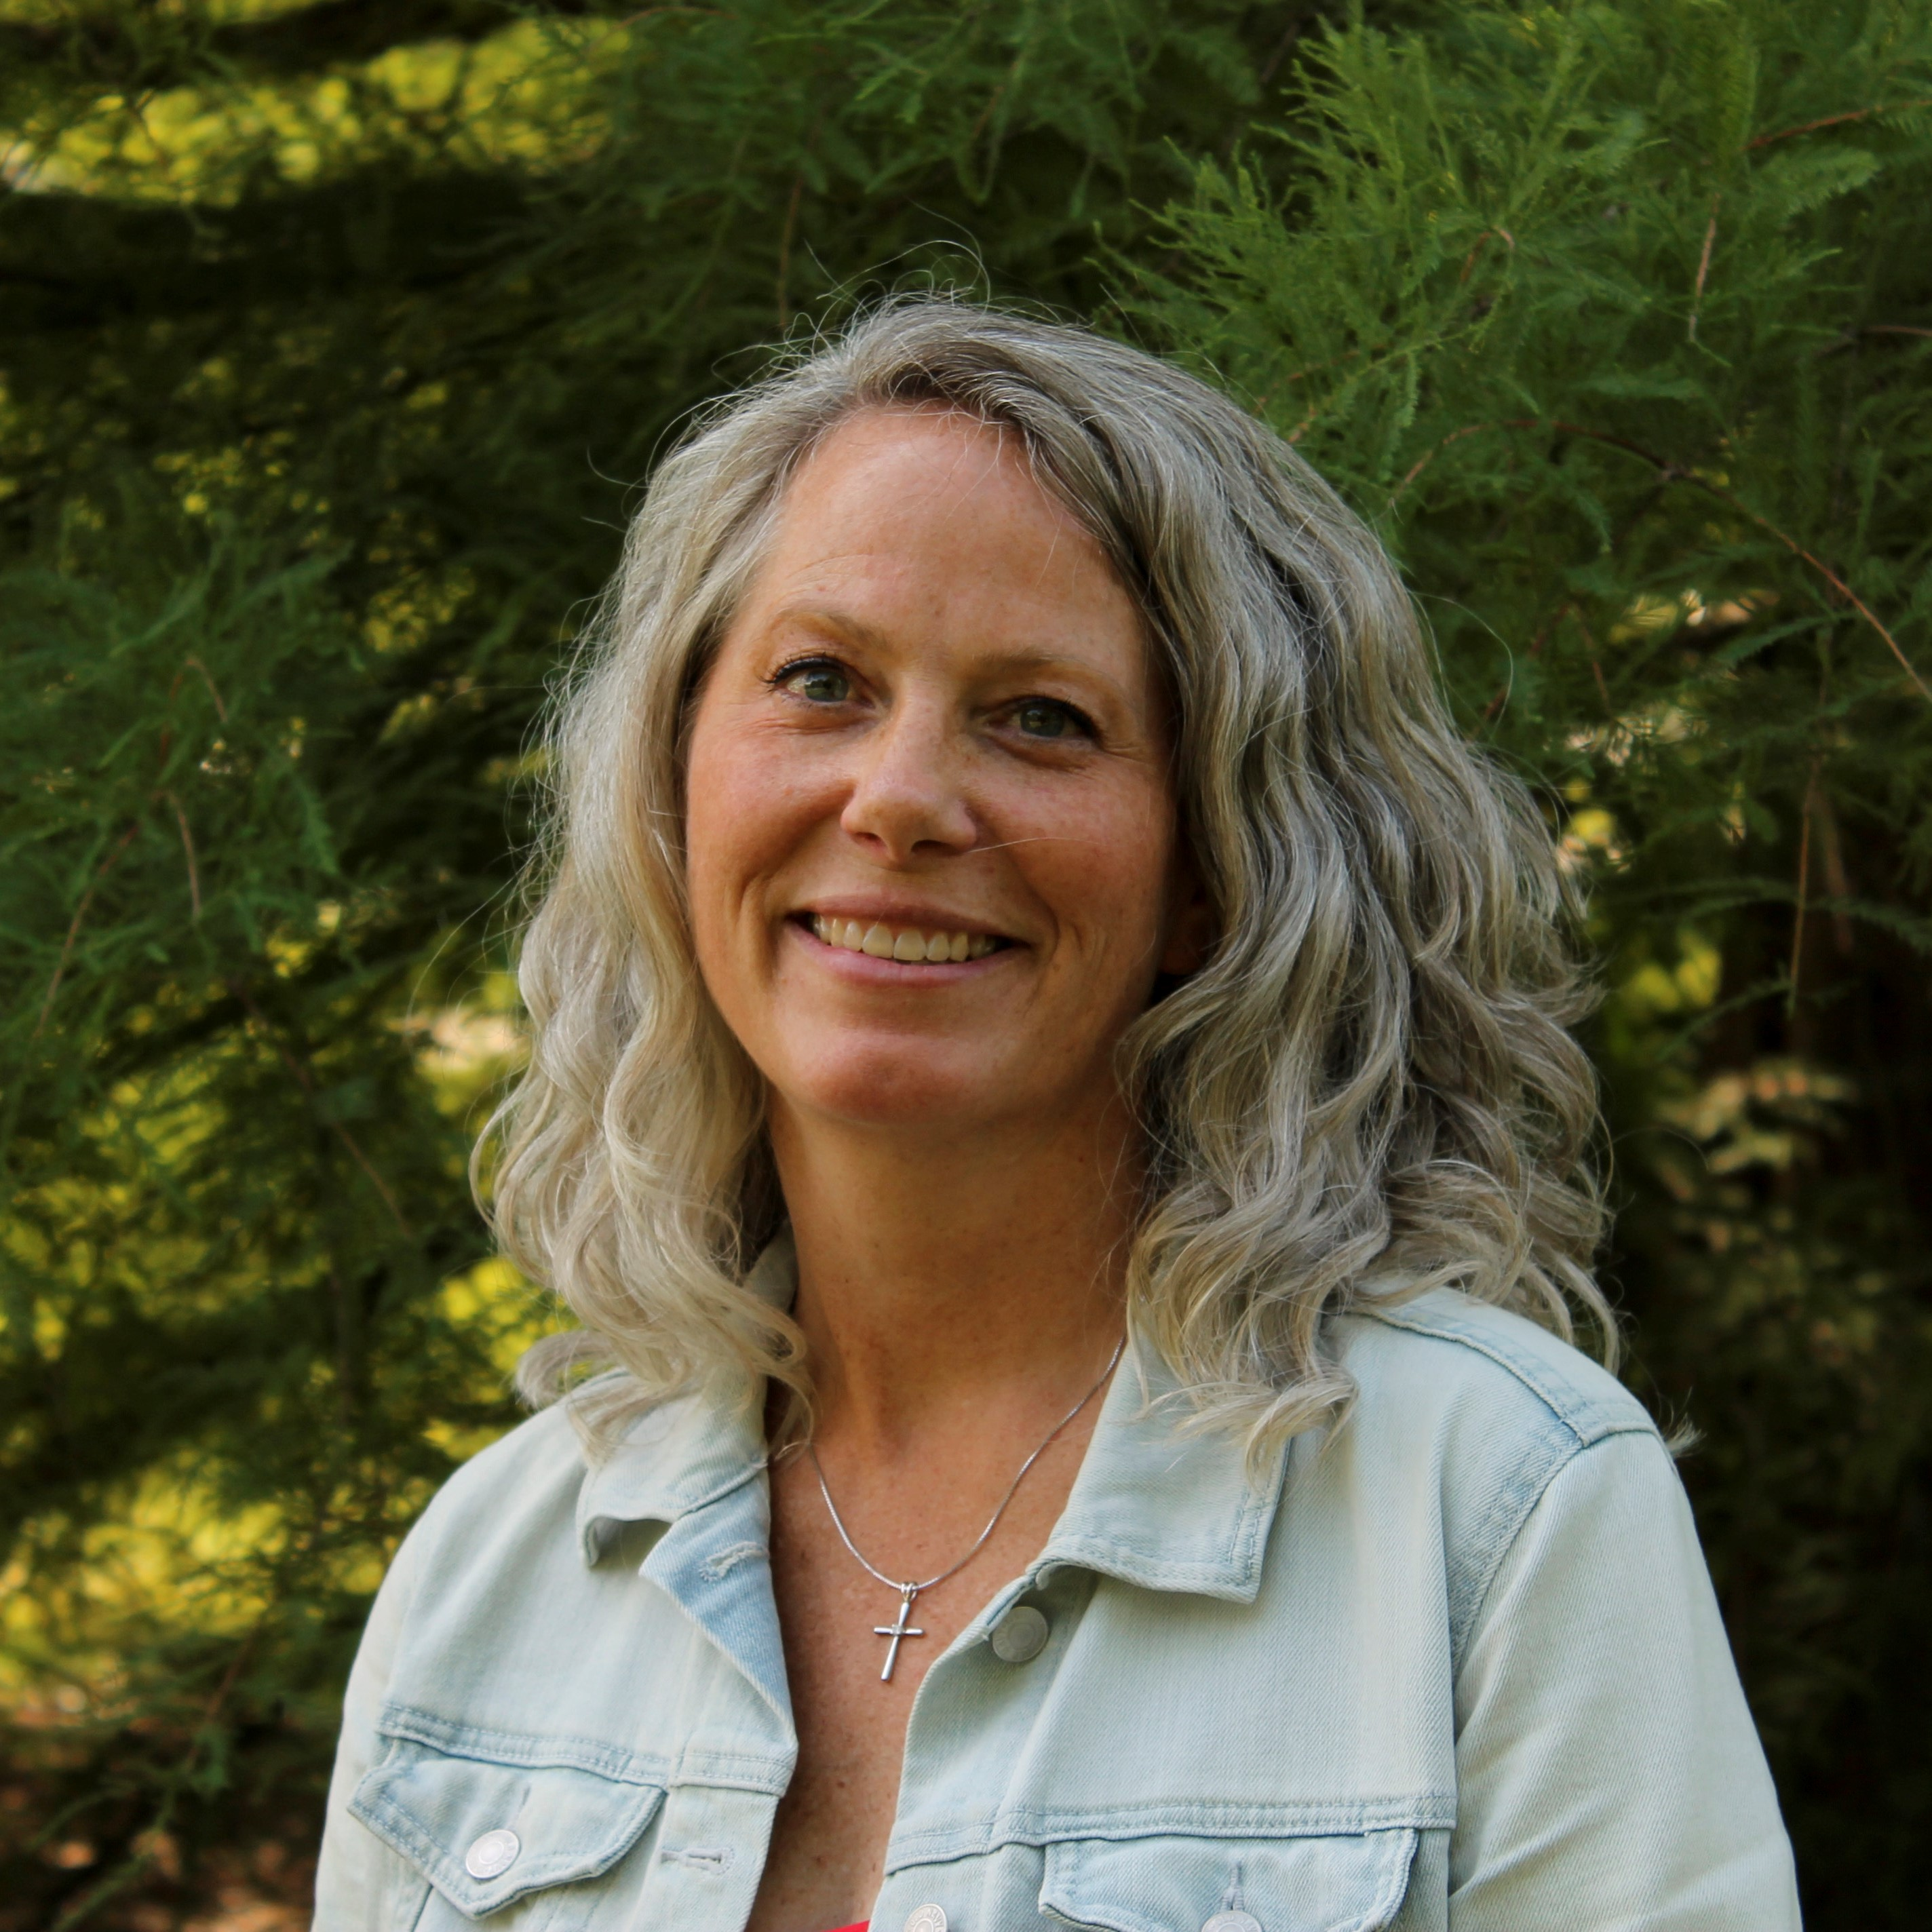 Shauna Shurba, Explorers II teacher at Clapham School in Wheaton, IL